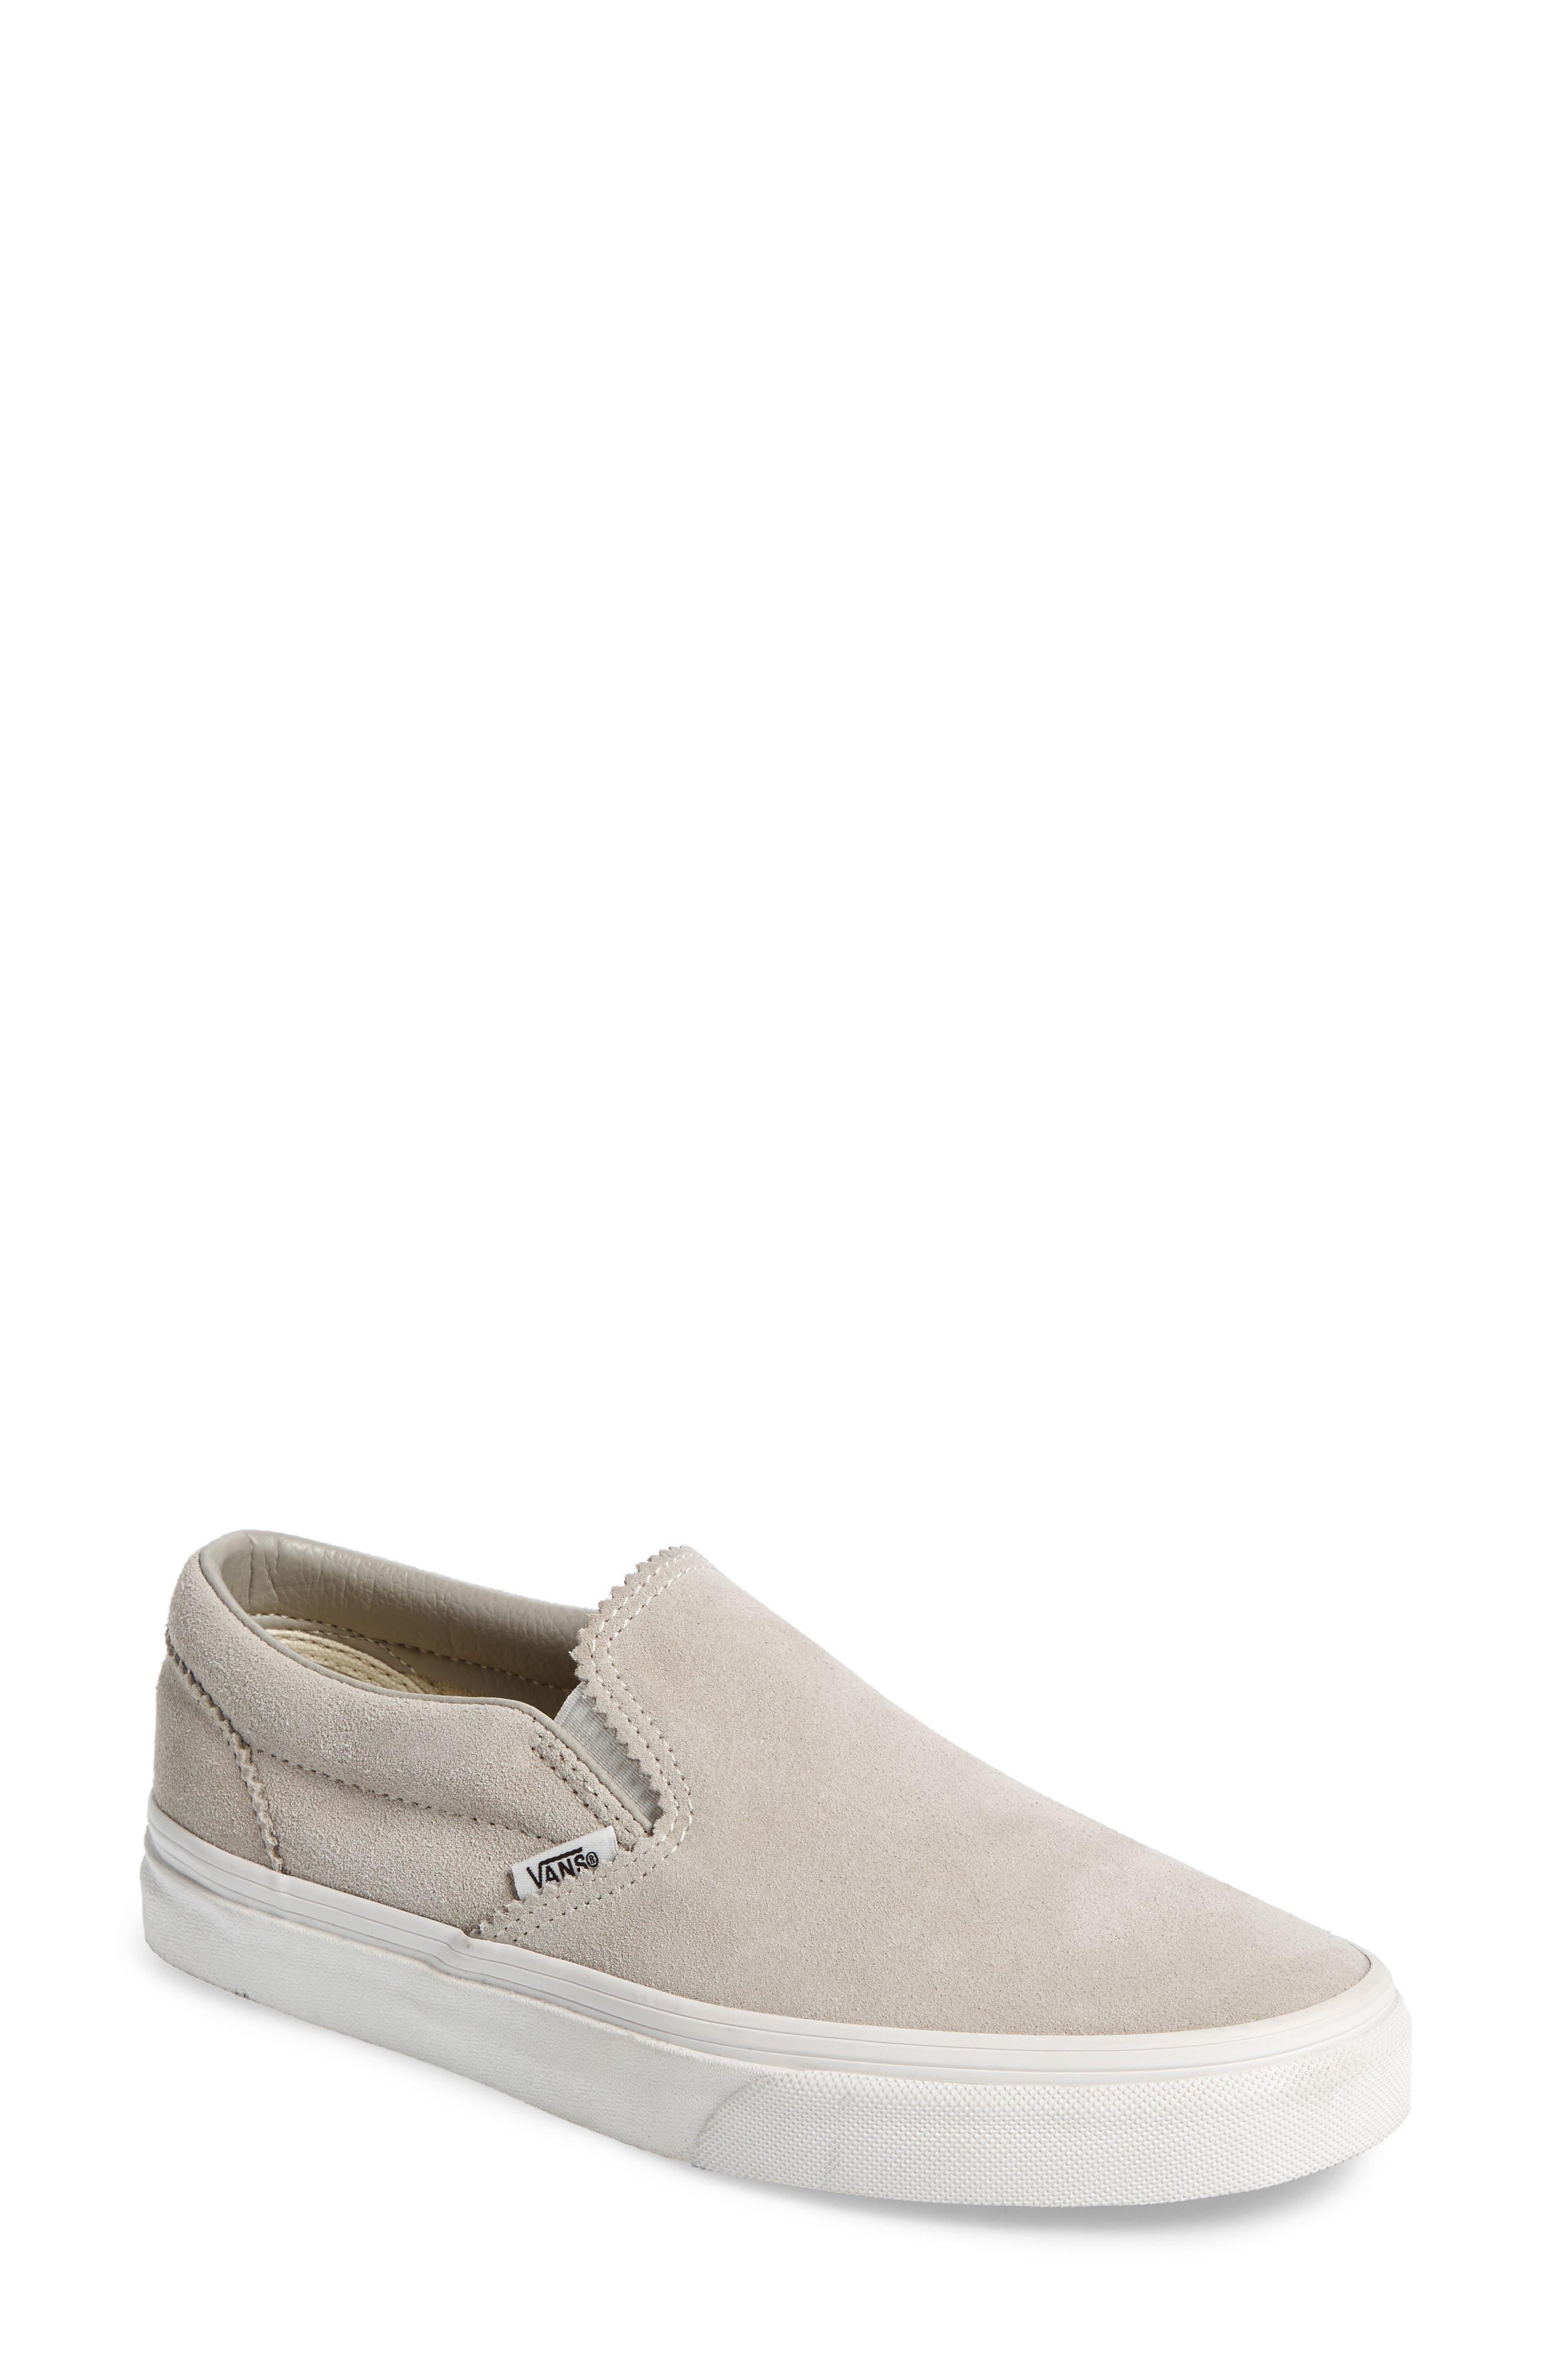 ,                             Classic Slip-On Sneaker,                             Main thumbnail 105, color,                             046